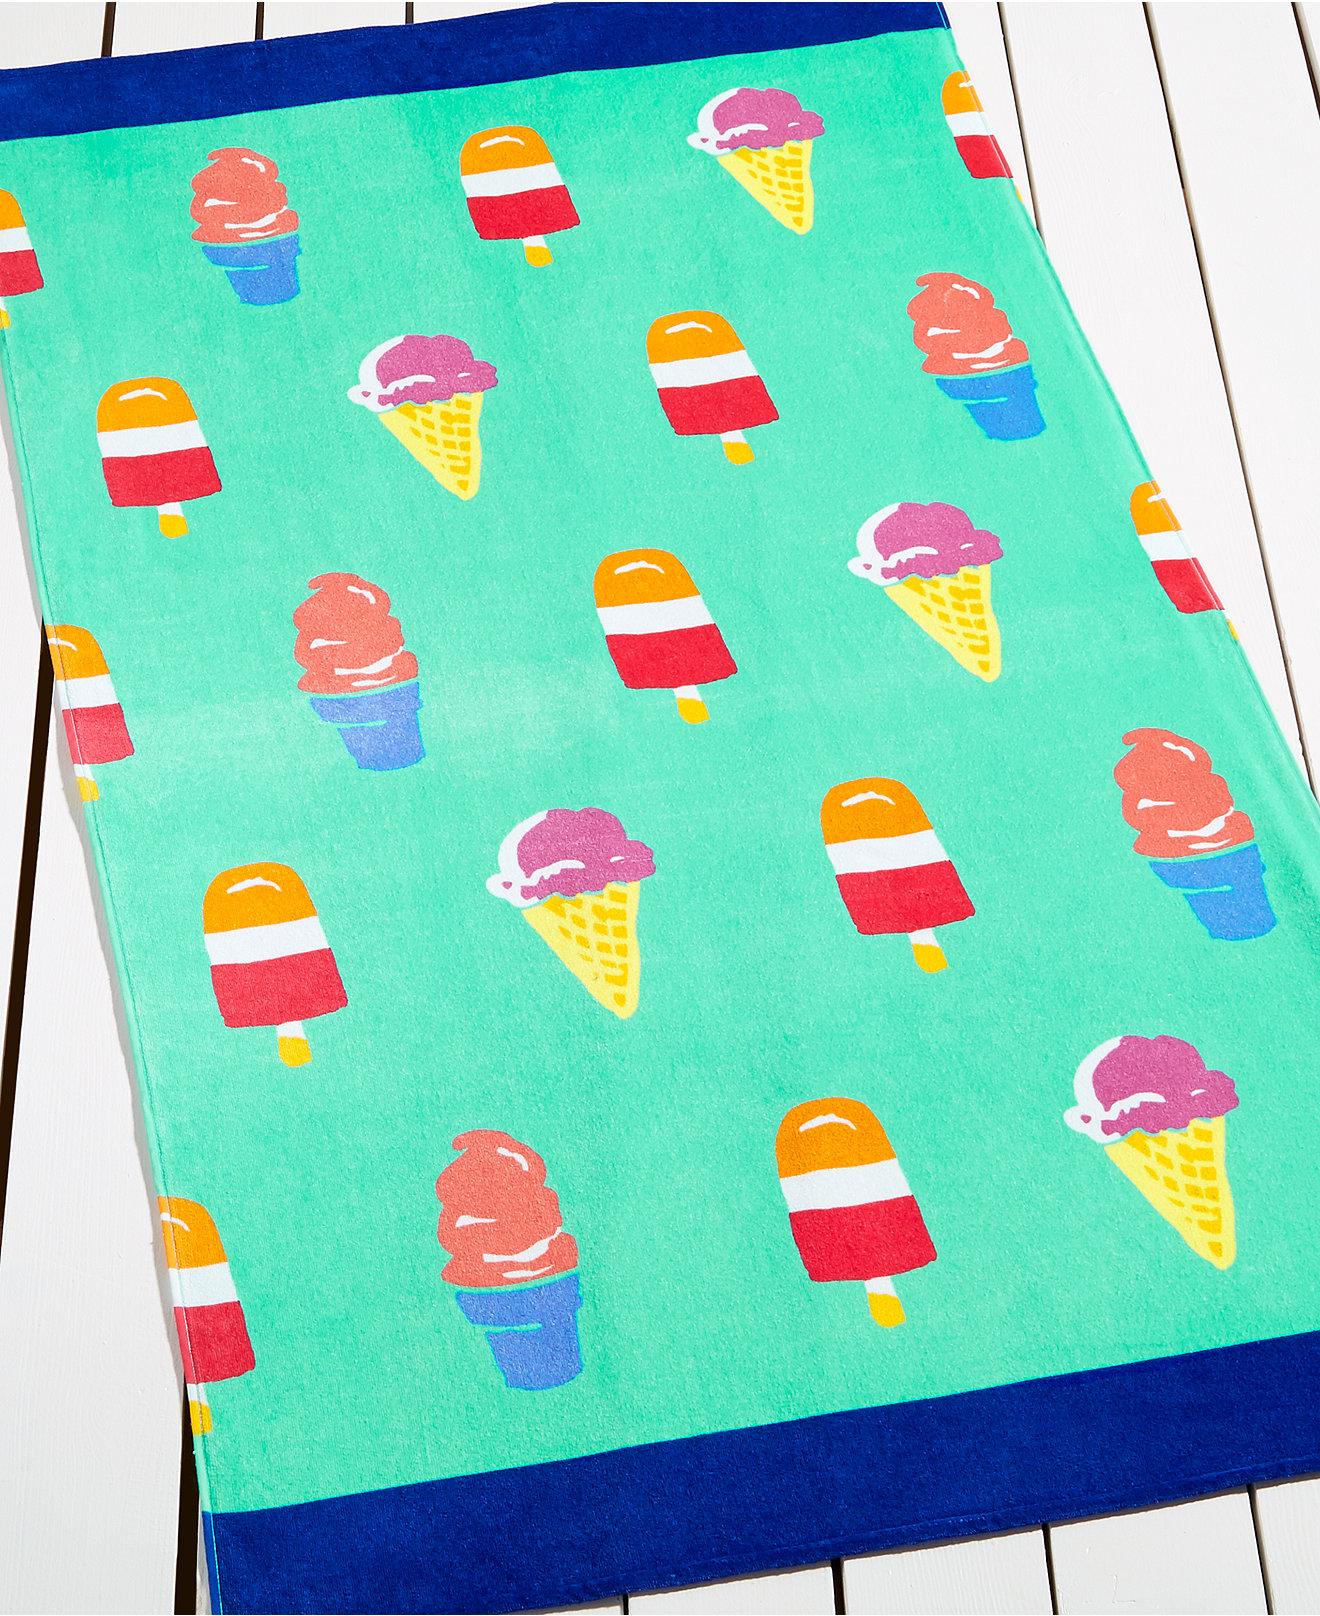 Ice Cream Beach Towel (for Martha Stewart)